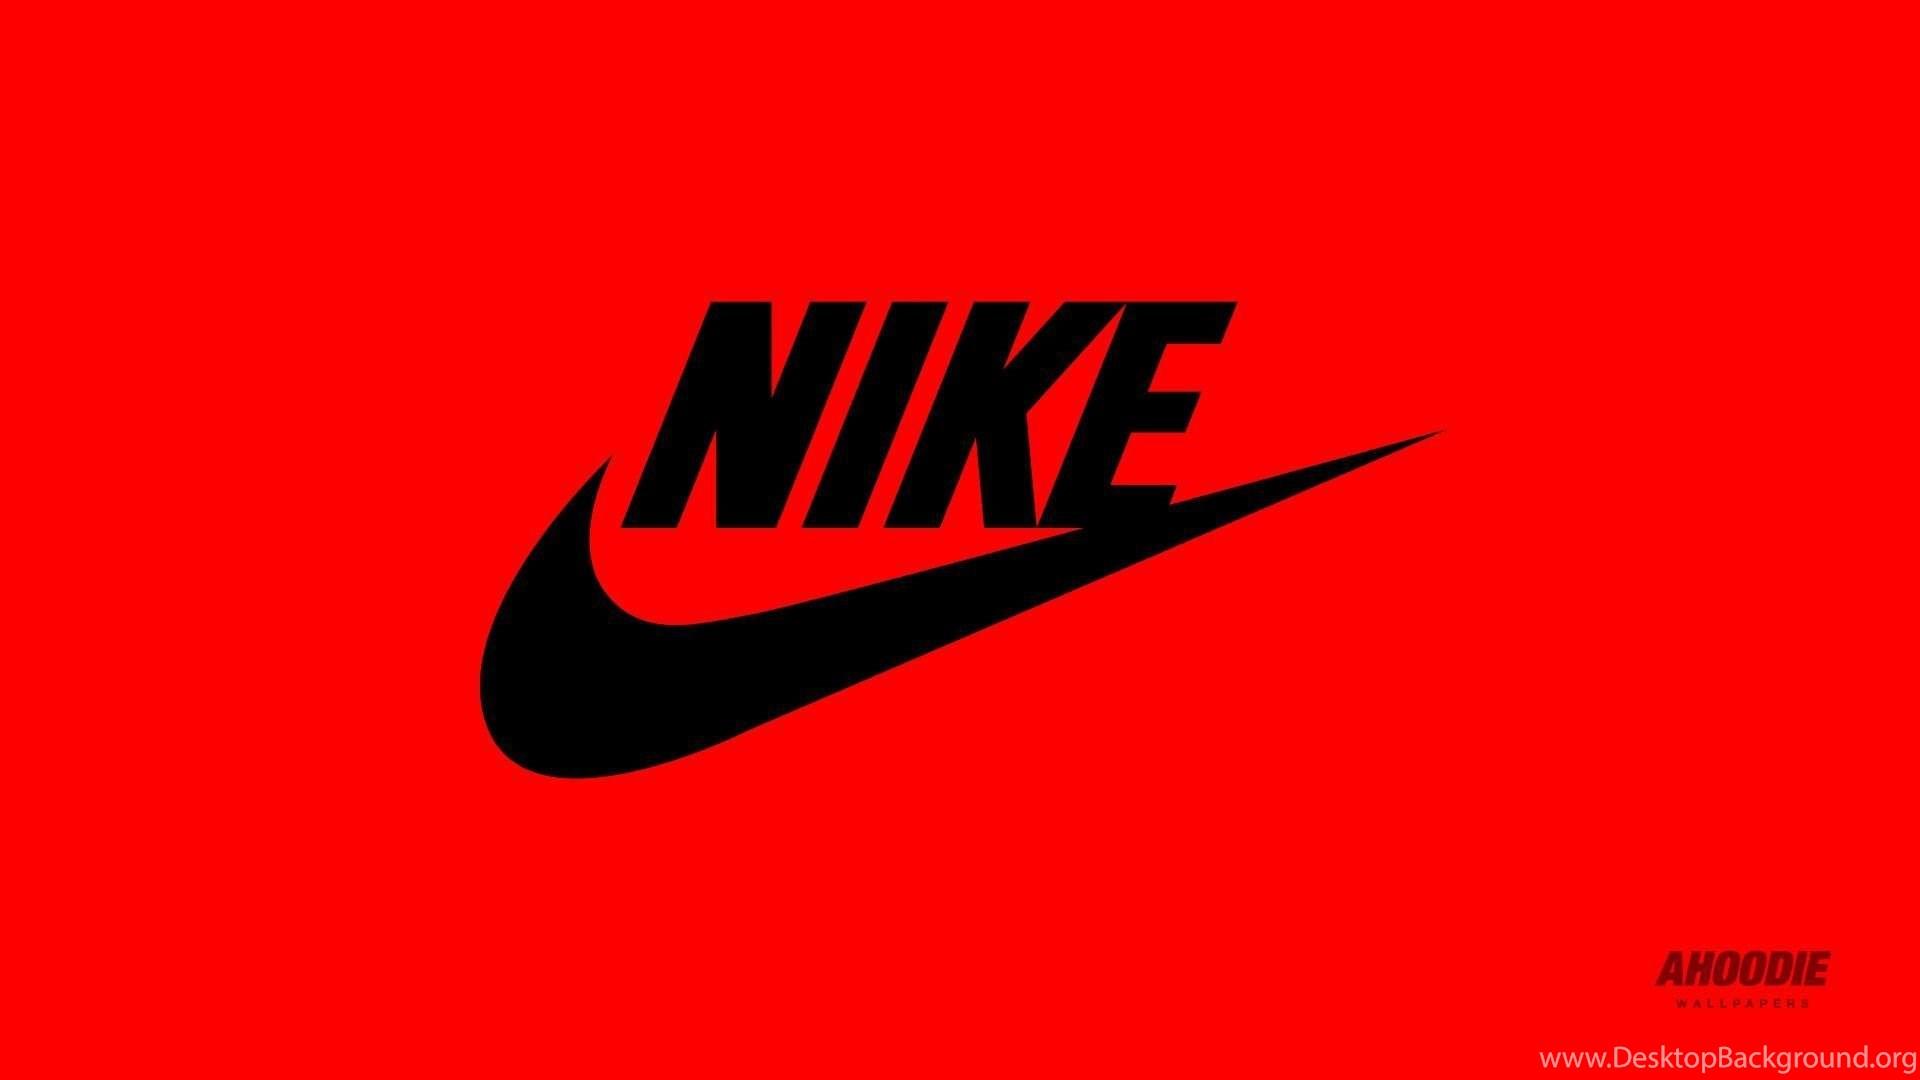 Alicia Sonrisa Espinoso  Nike Shoes Wallpapers Desktop Desktop Background